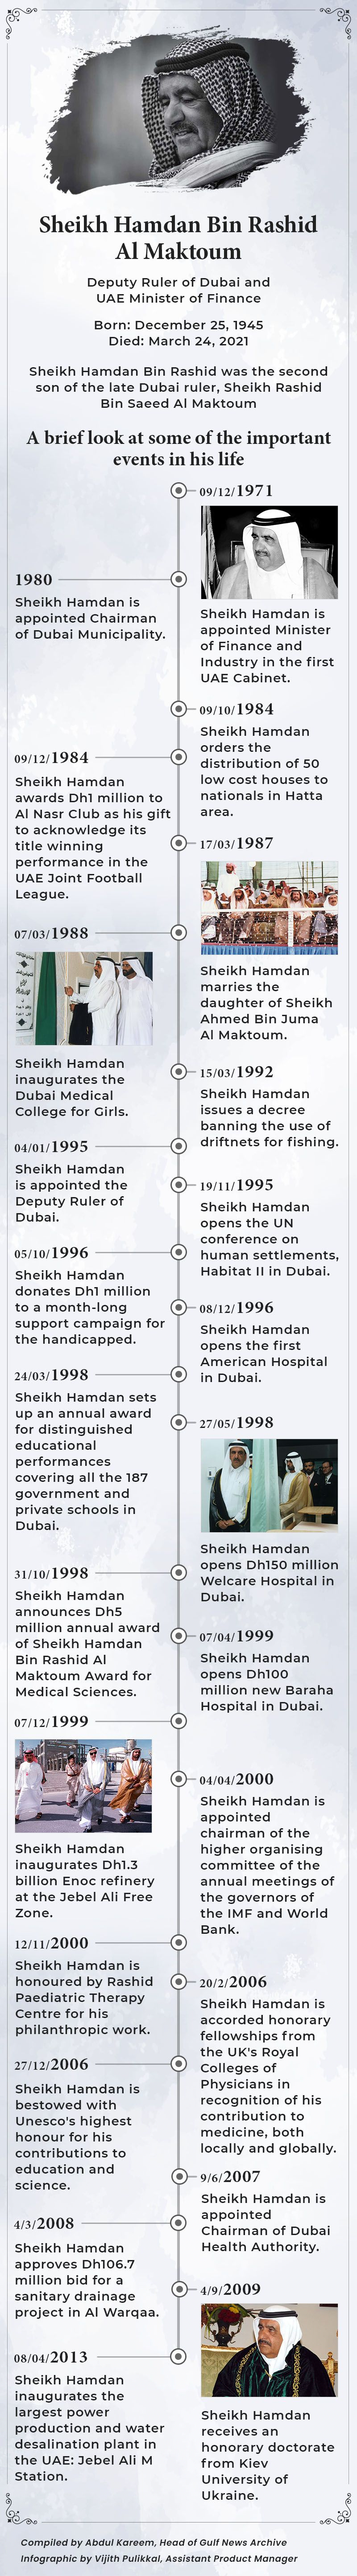 Sheikh Hamdan Bin Rashid Al Maktoum infographic